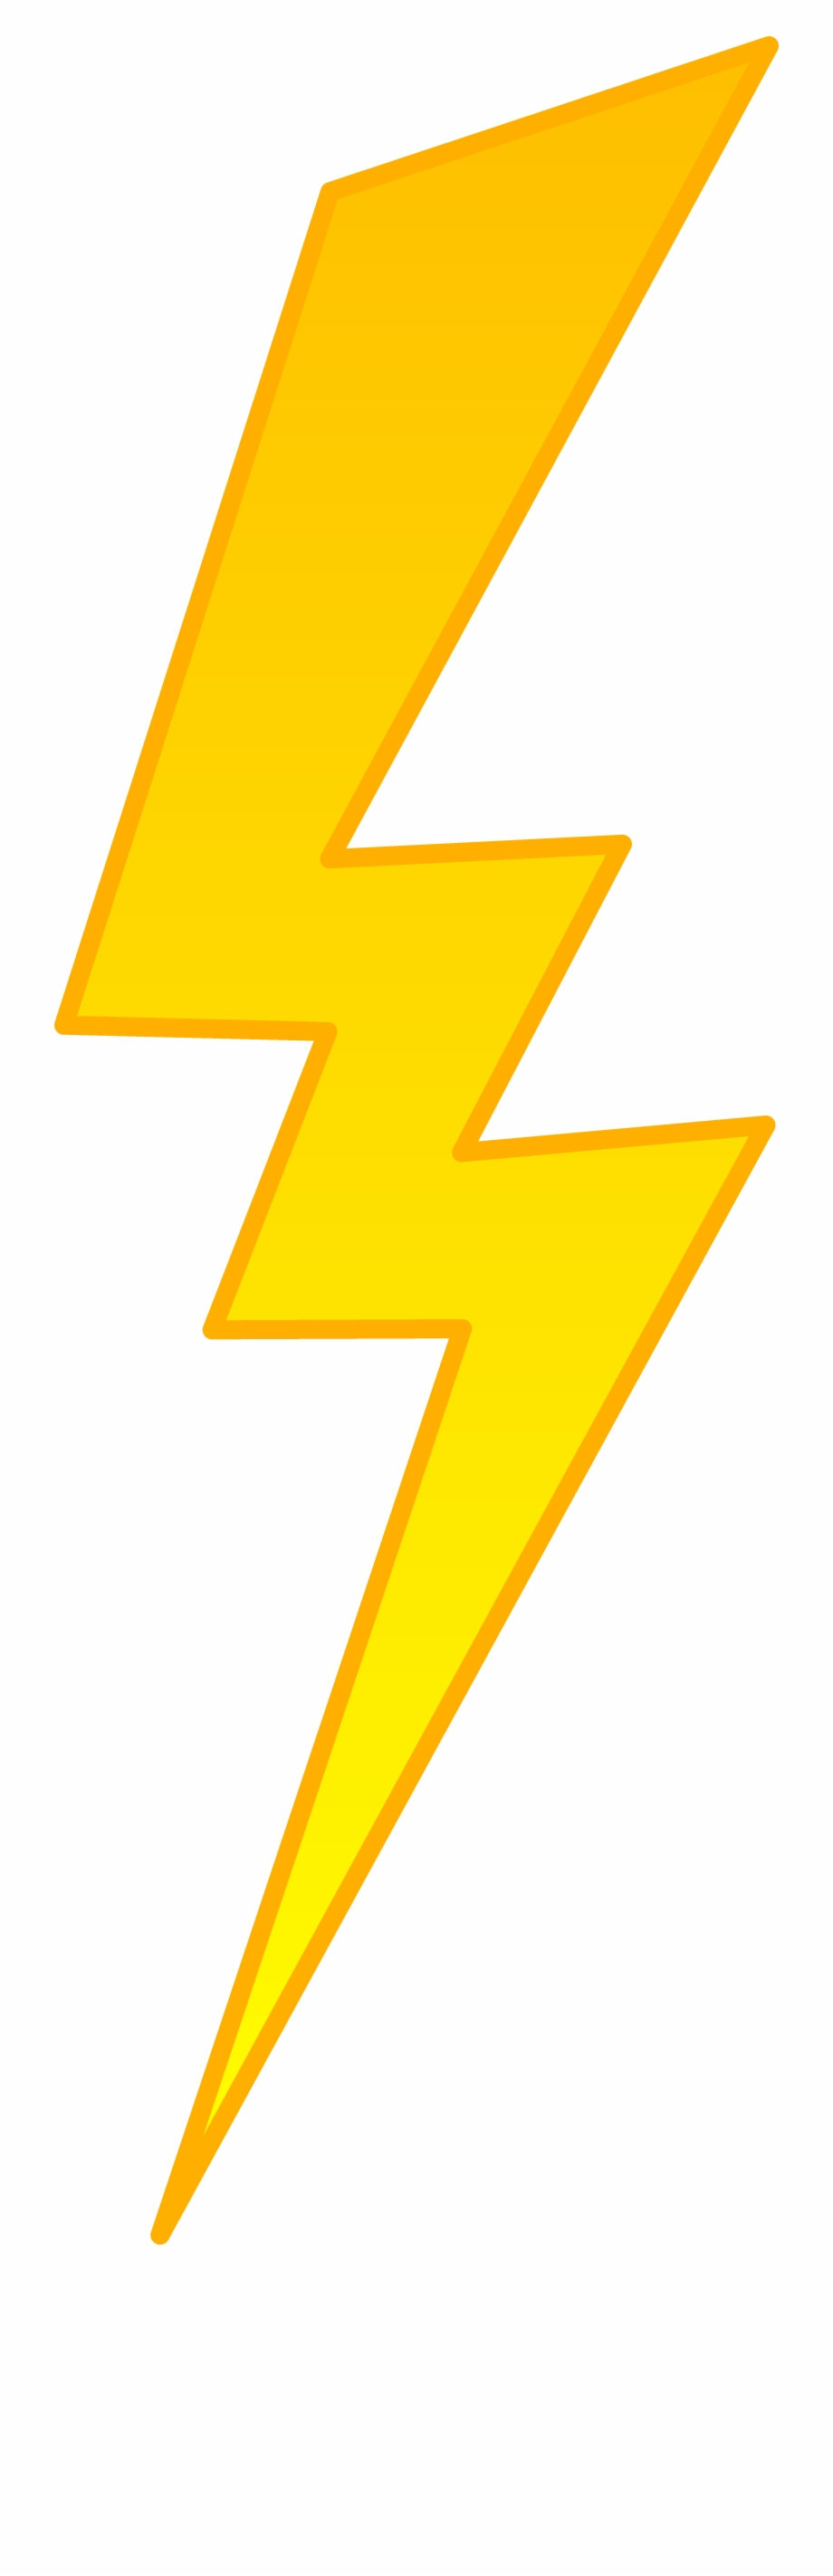 clipart royalty free stock Bolt clipart gold. Golden lightning symbol free